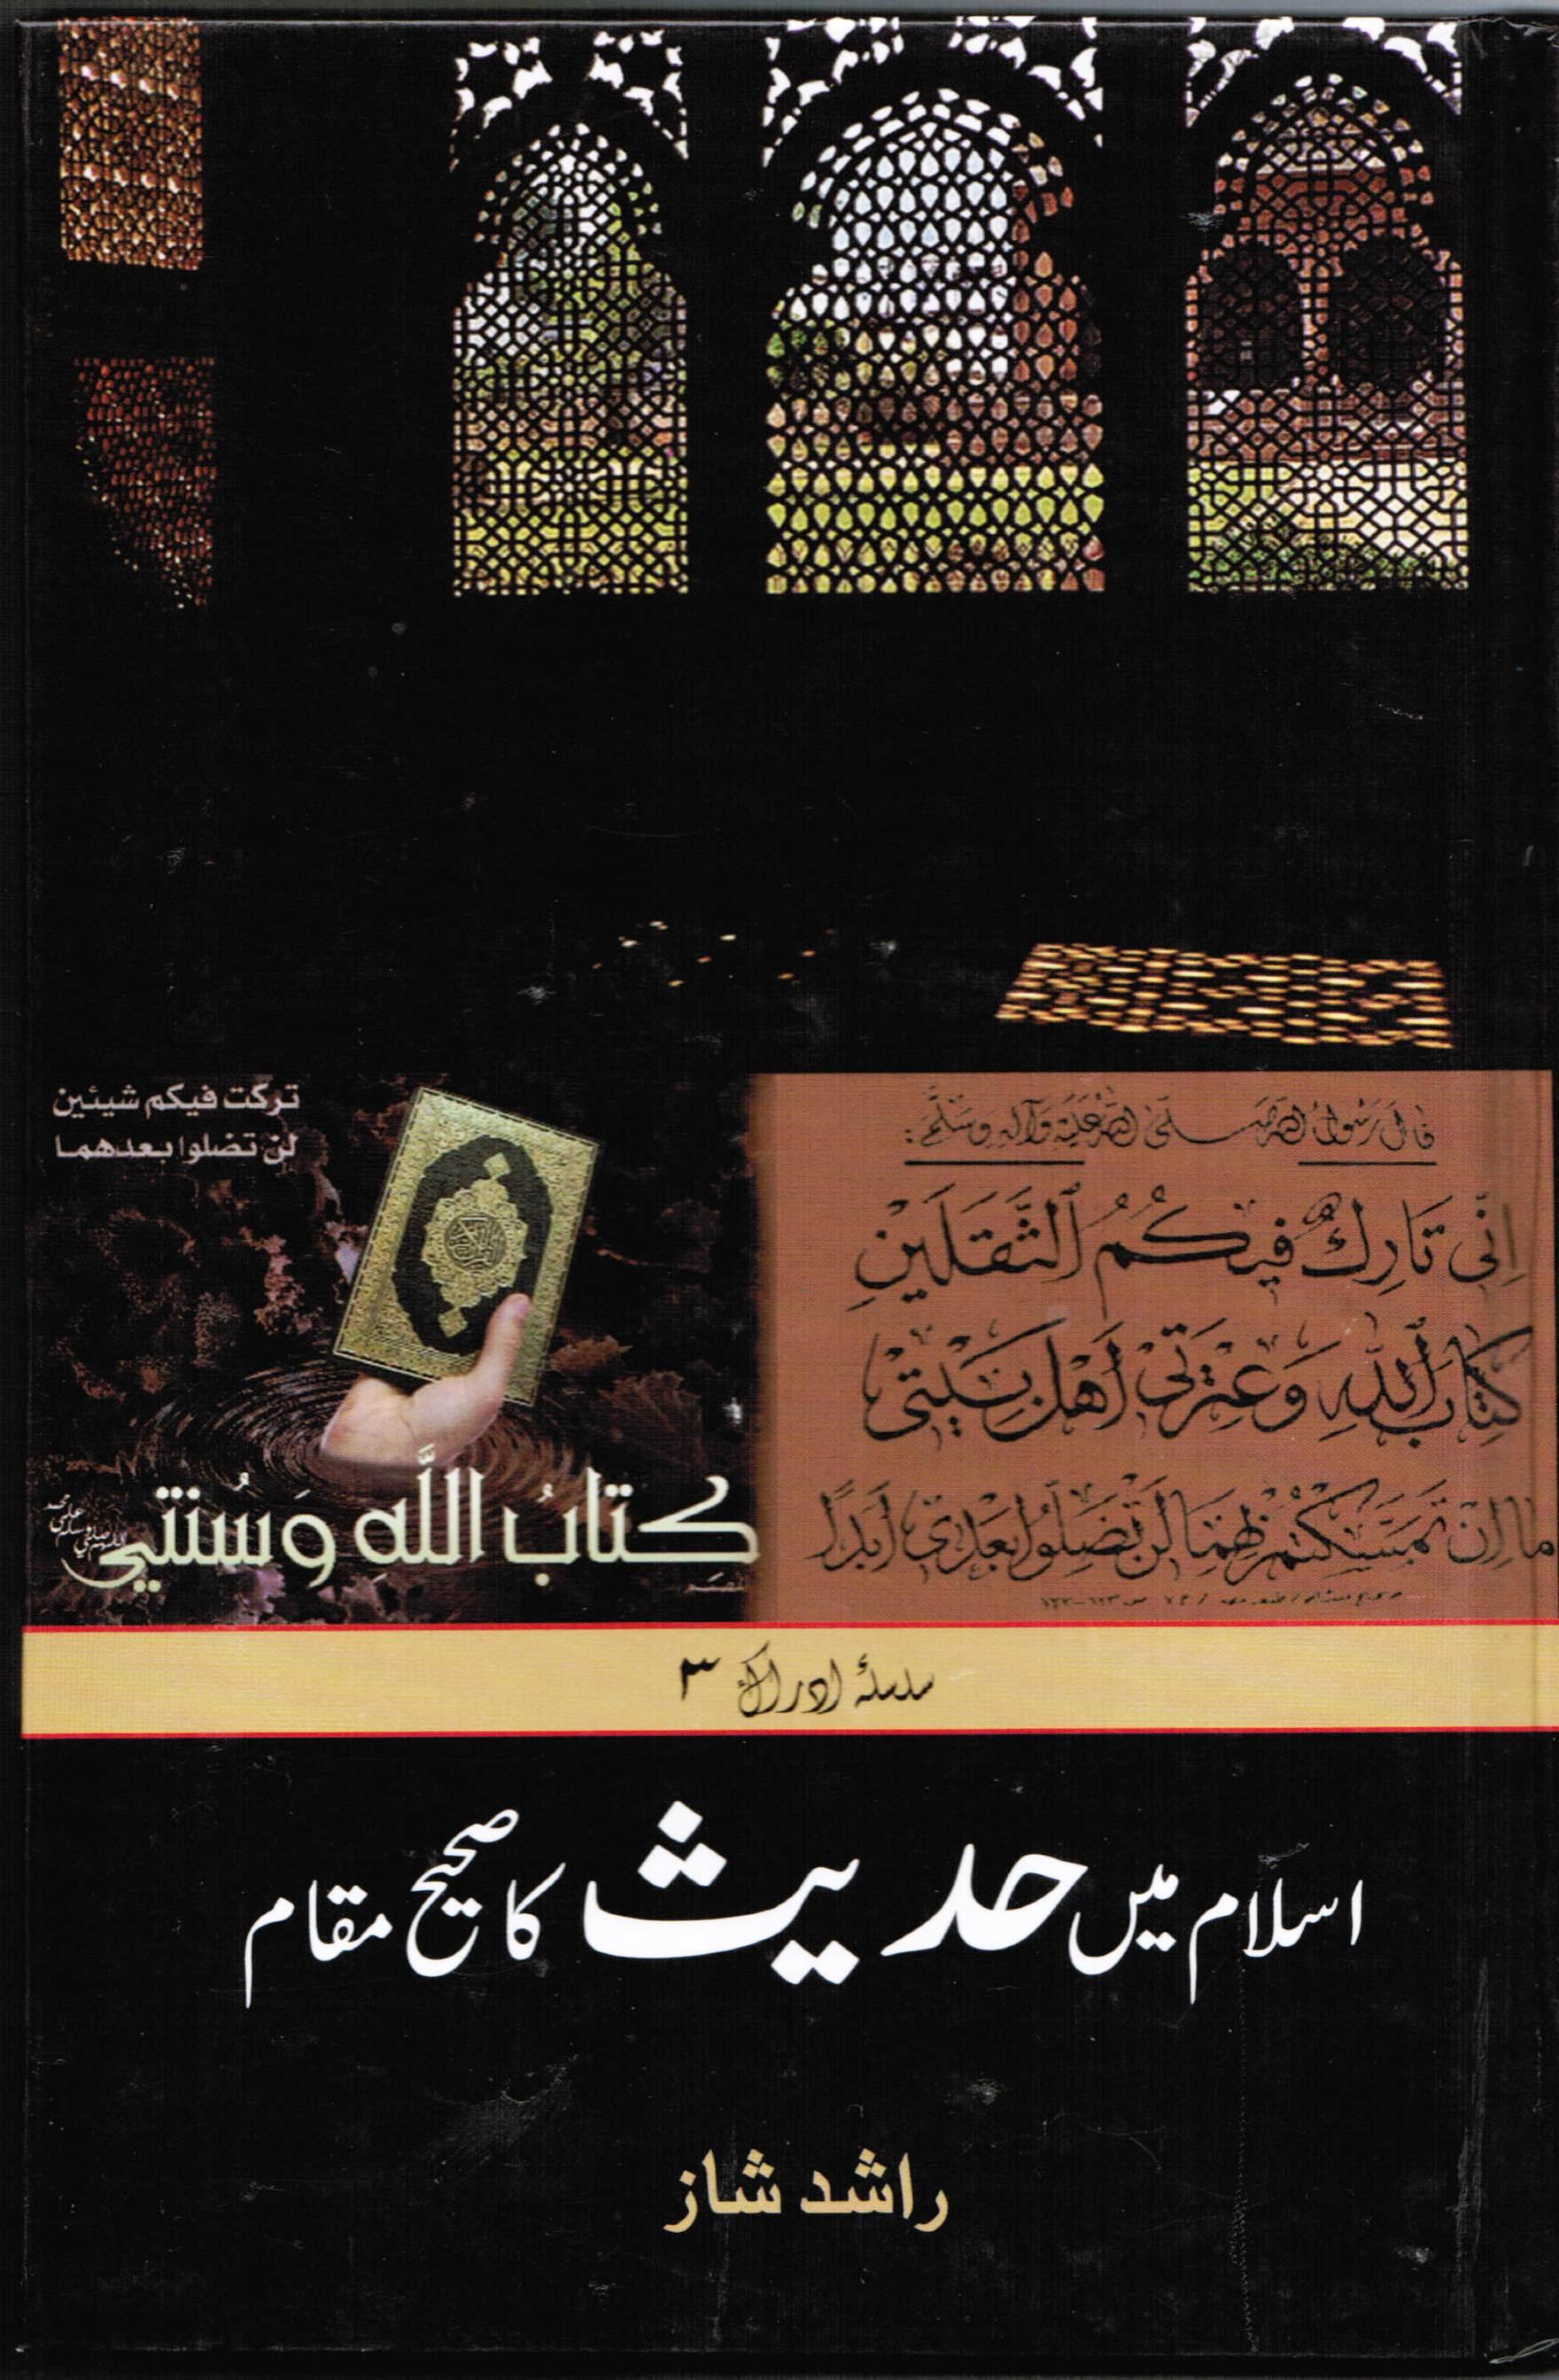 Islam me Hadees ka sahi Muqam